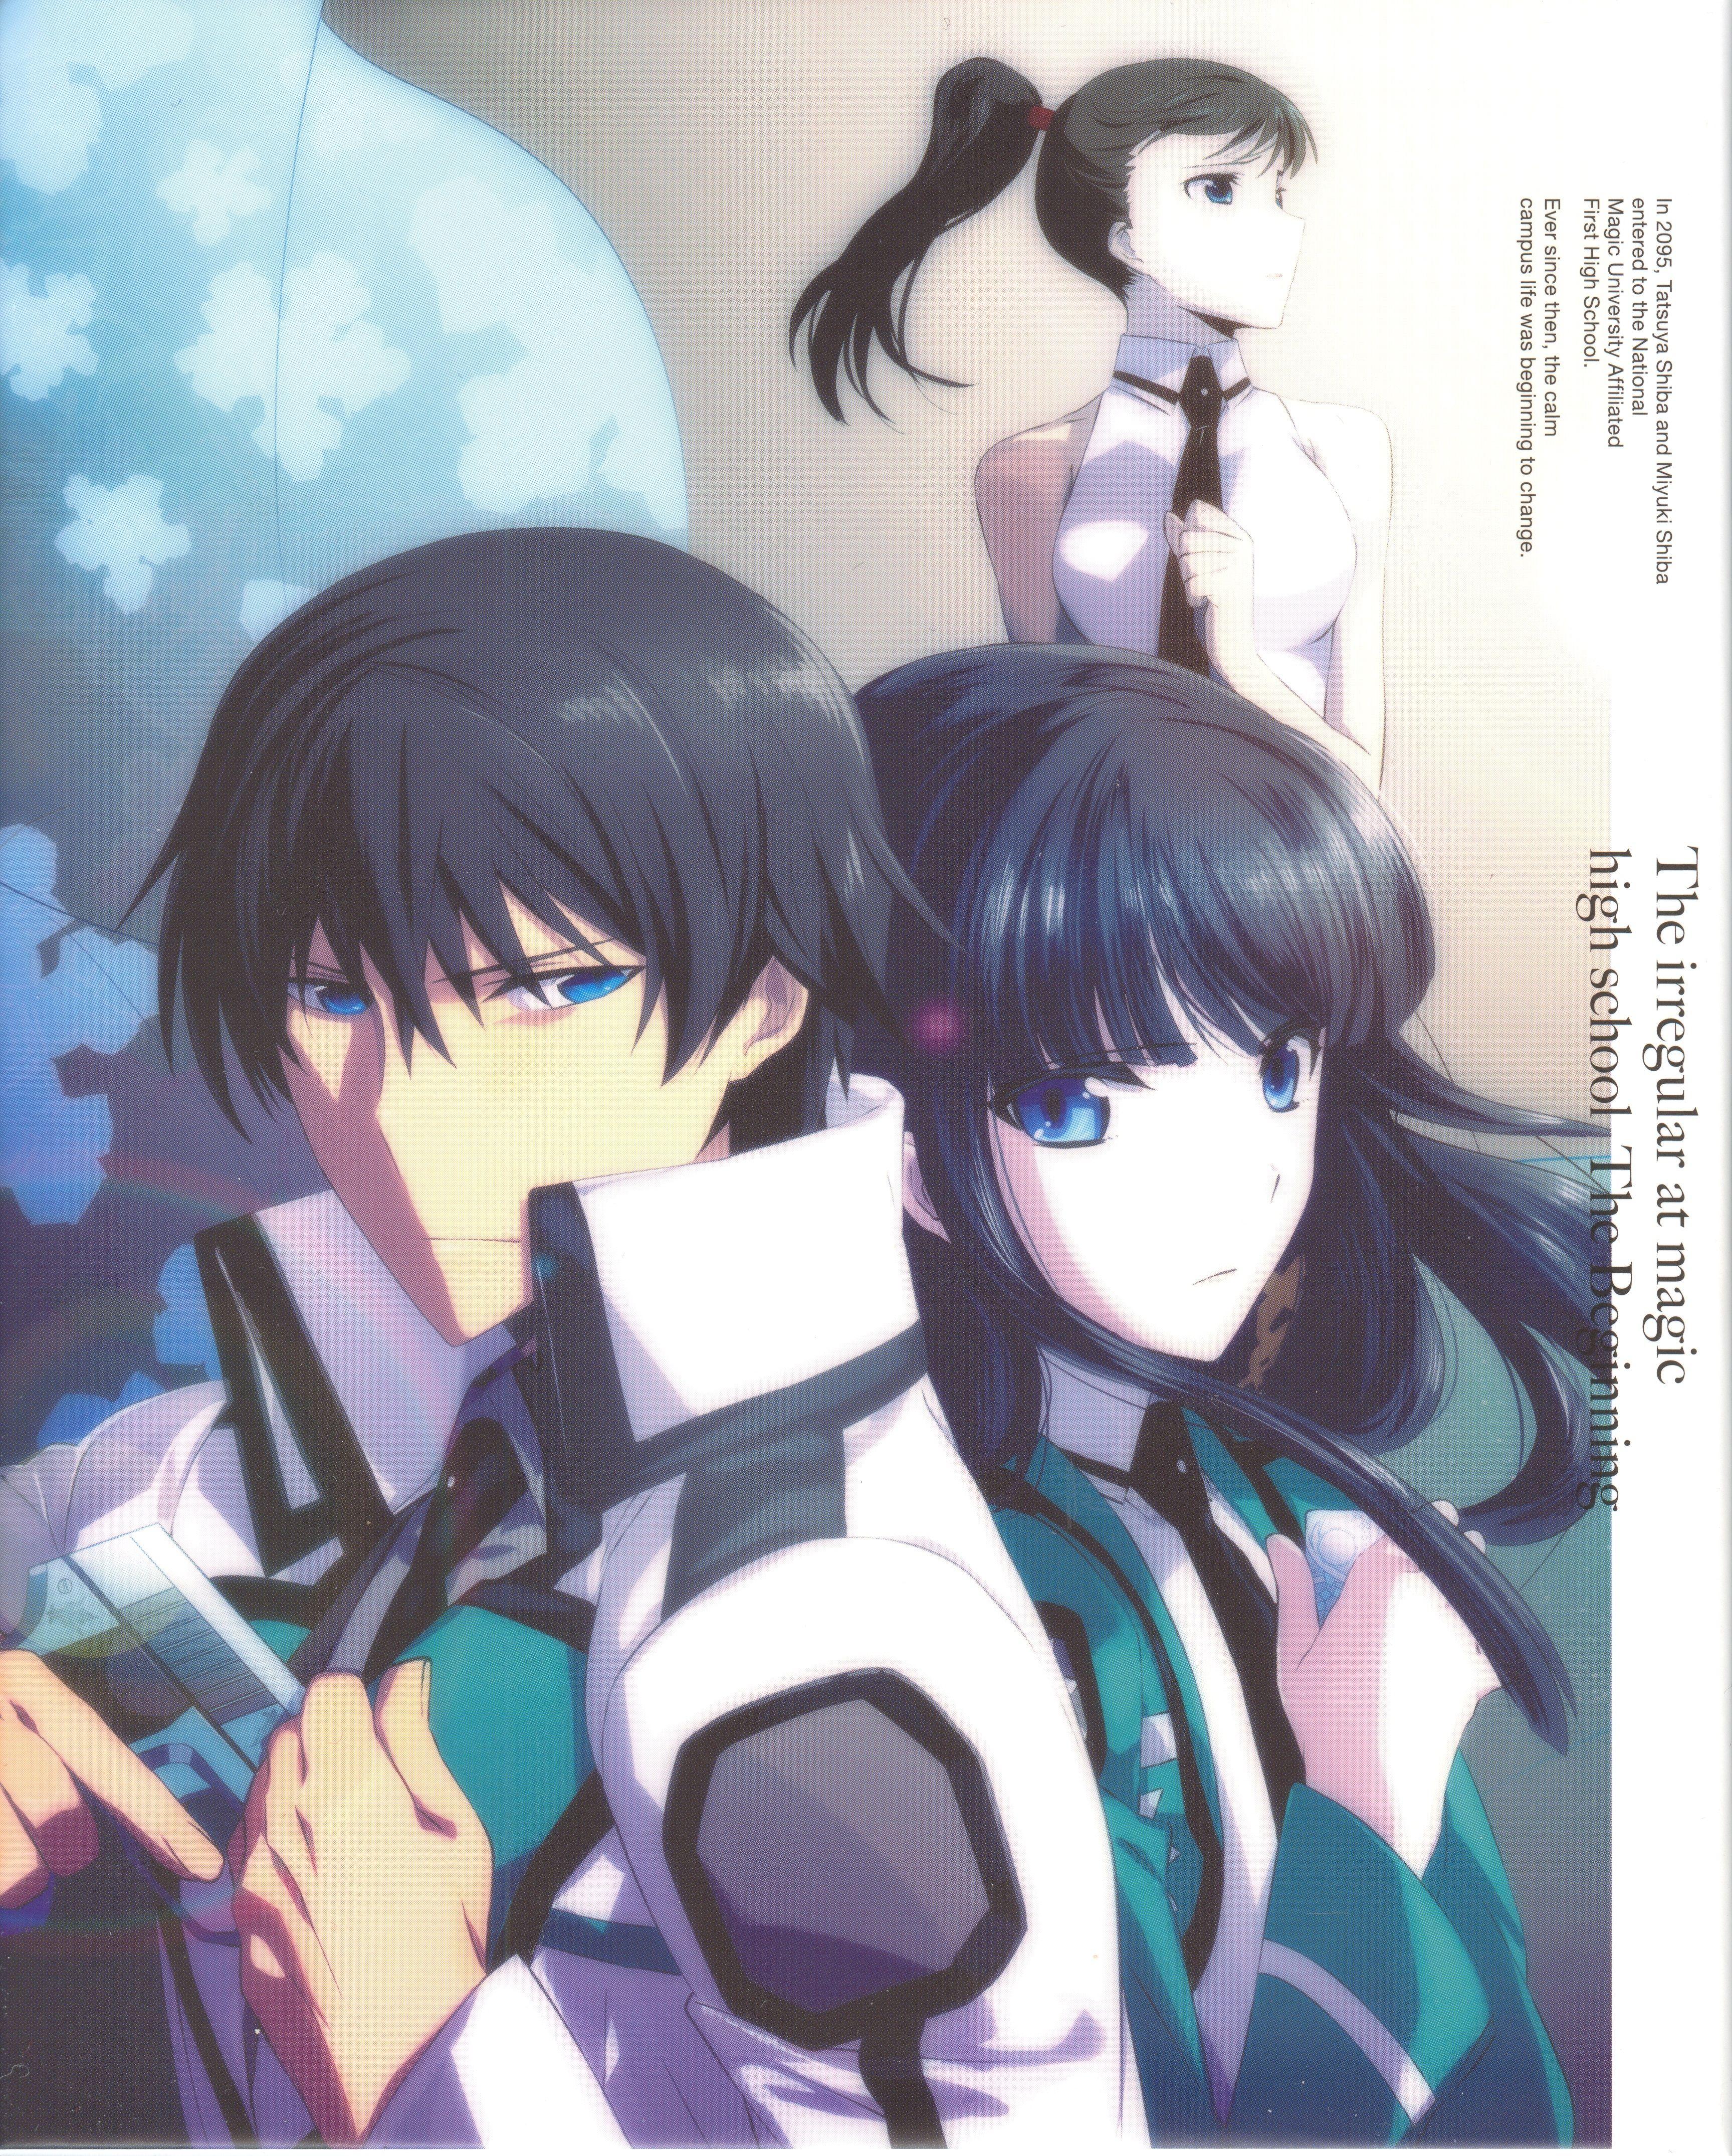 Mahouka Koukou No Rettousei 1748490 Anime Mibu Anime Images